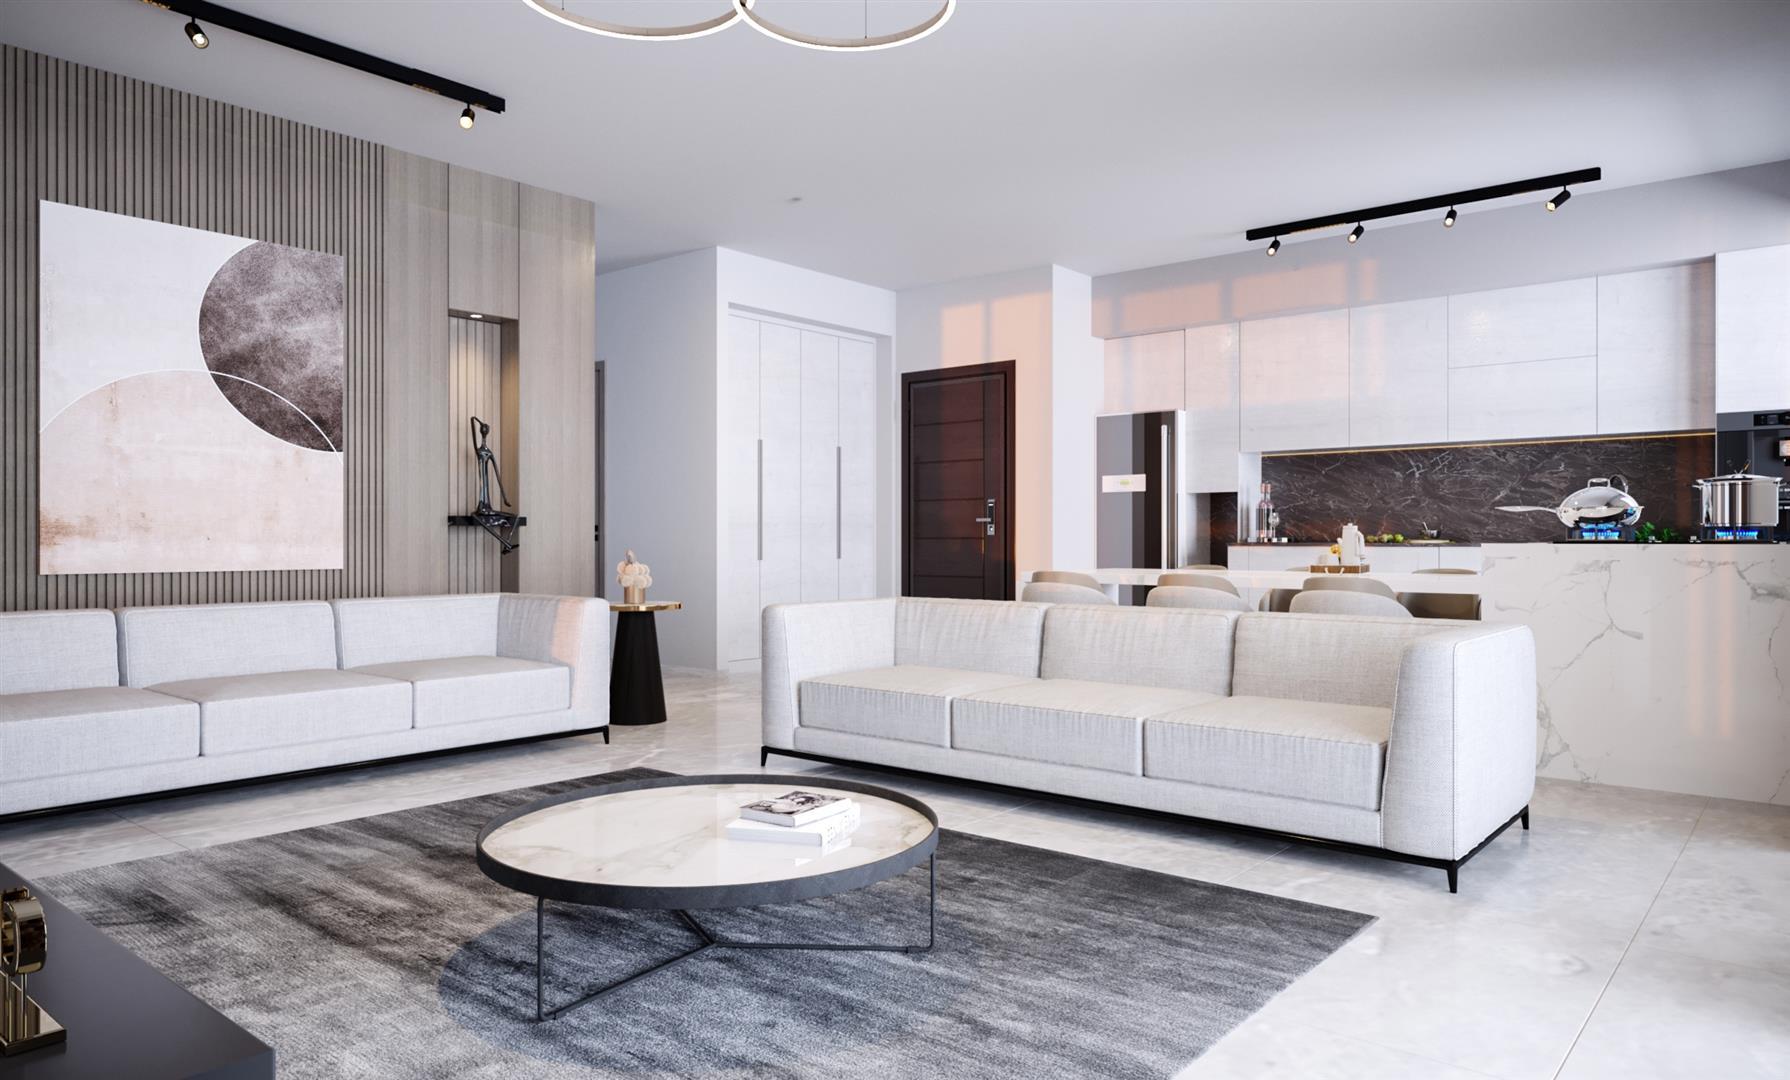 Luxury 3 bedroom resort-style accommodation